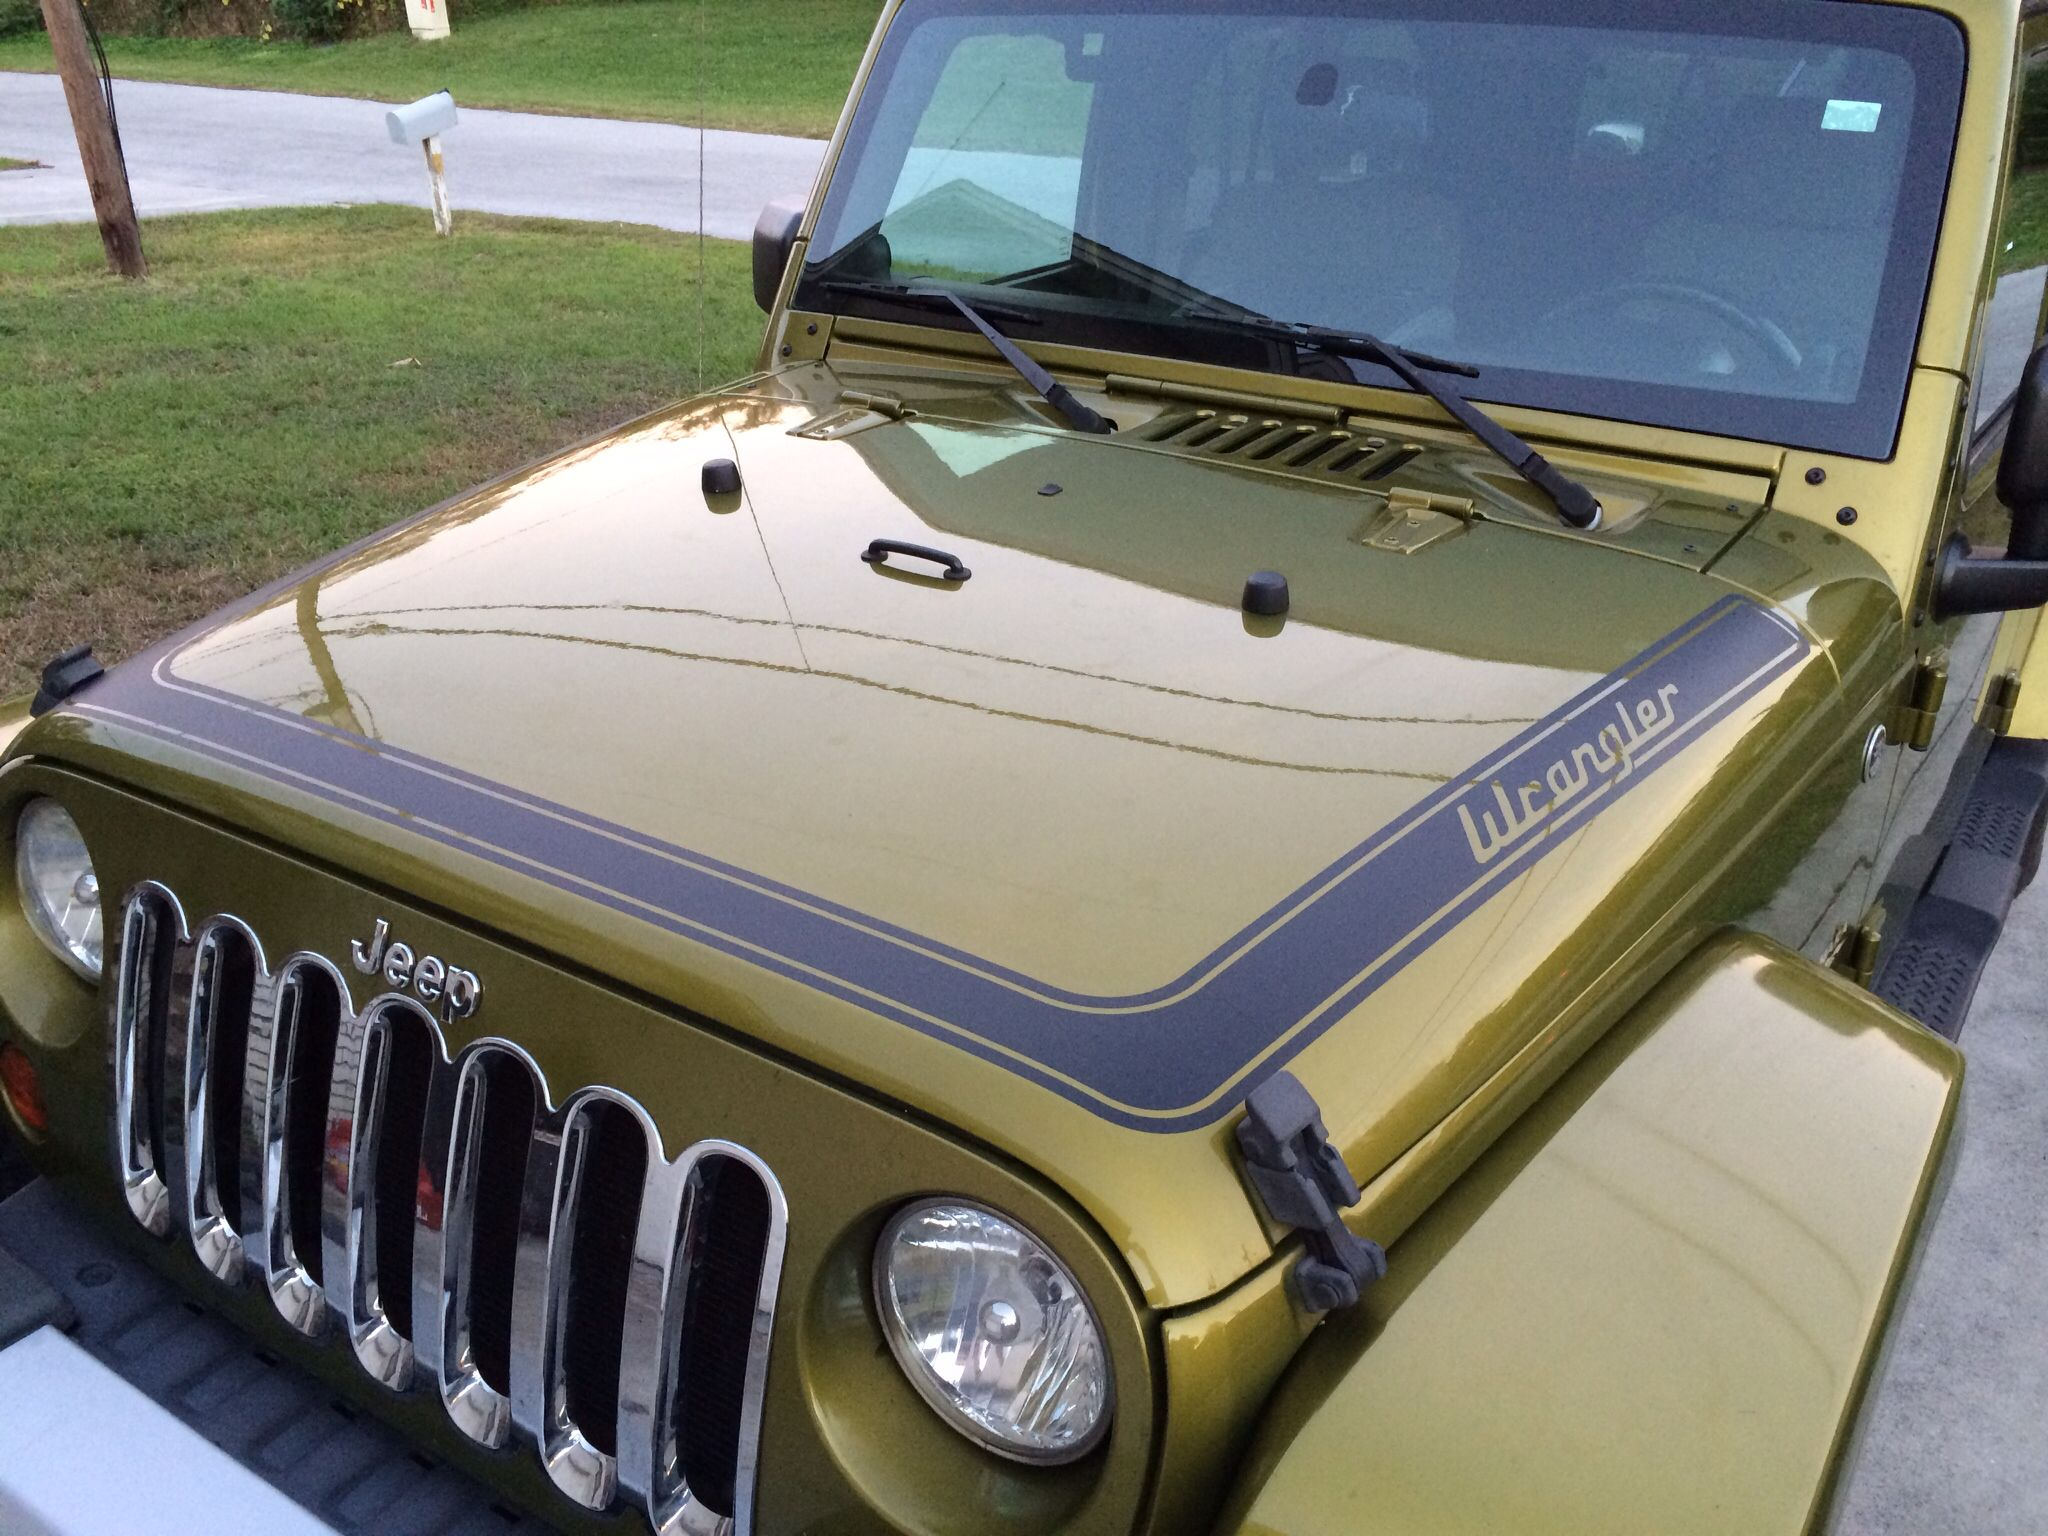 Jeep Wrangler JK Hood Graphics Jeep Graphics Pinterest Jeep - Jeep hood decalsgraphics for jeep wrangler hood decals and graphics www